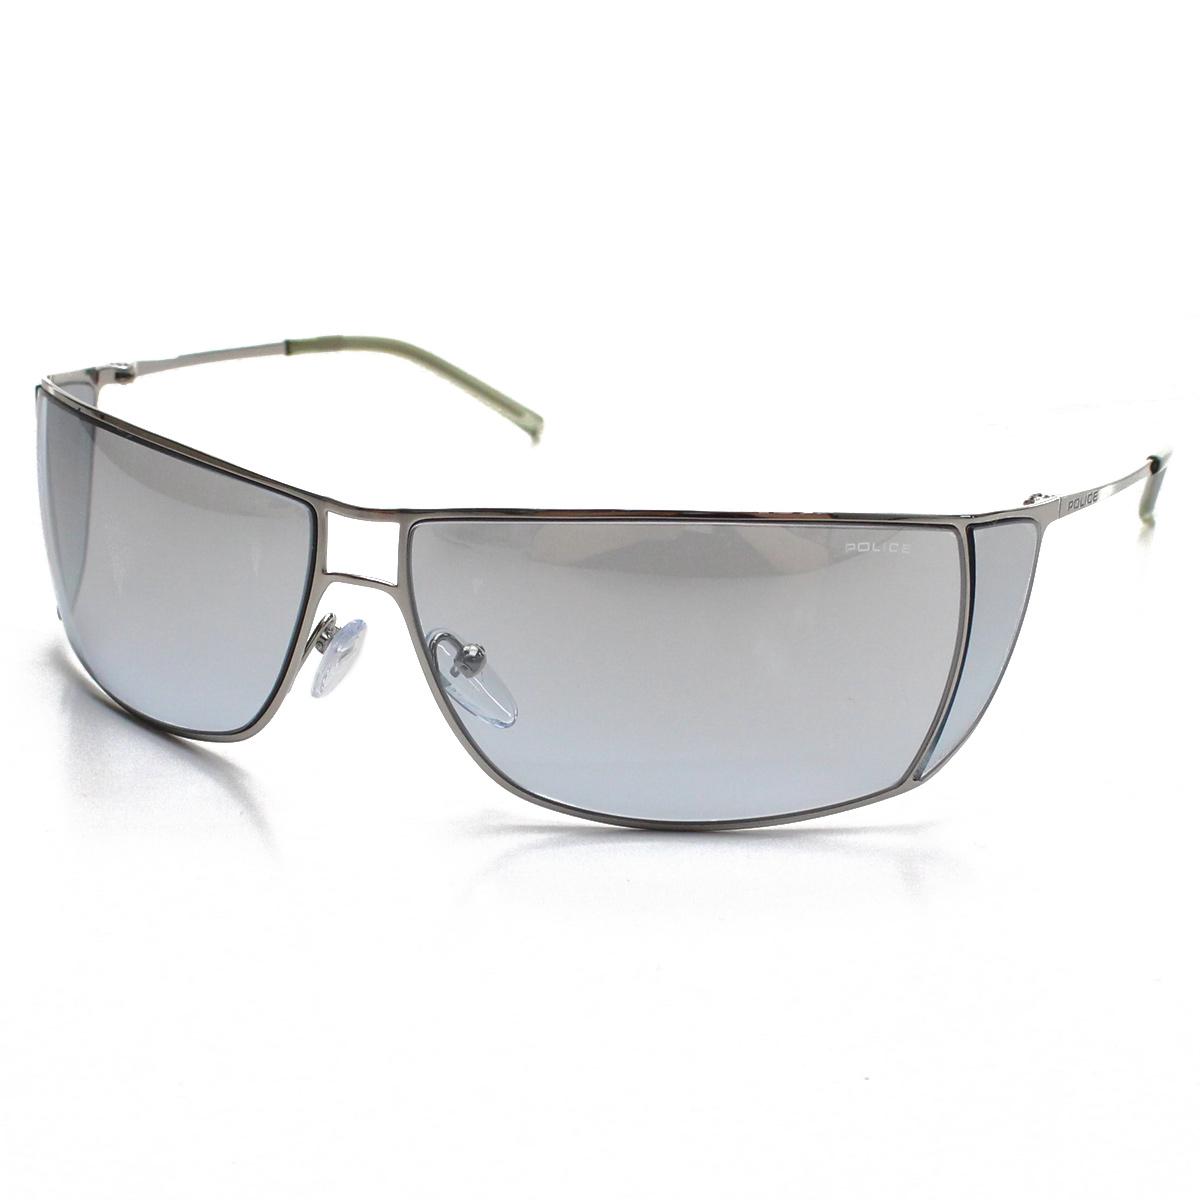 7e198eb416b8a Sunglasses